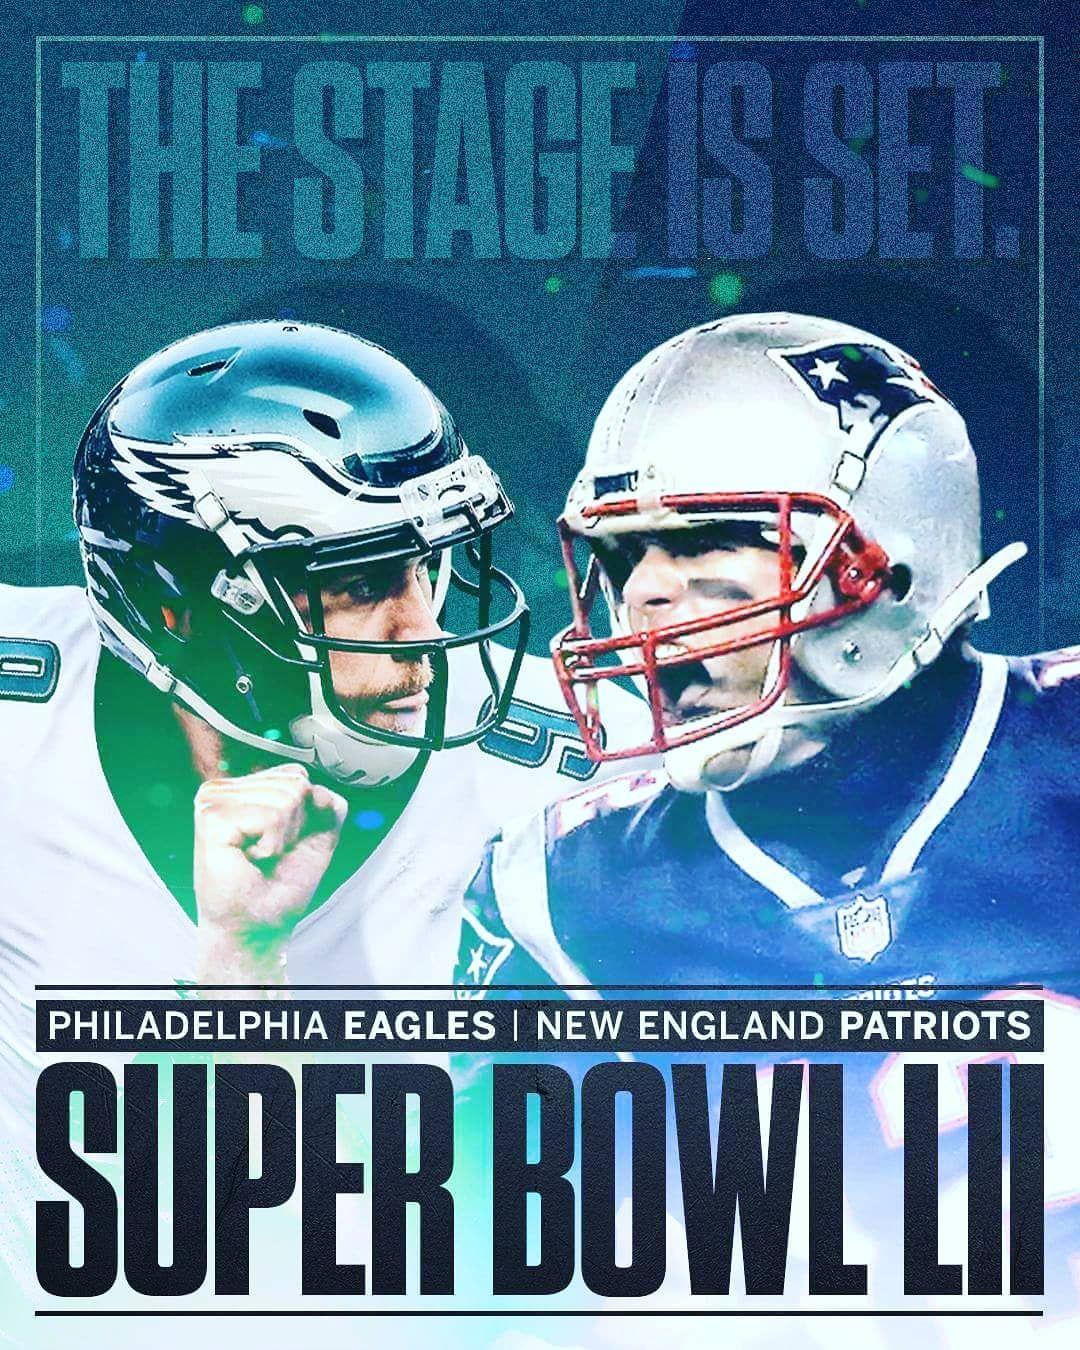 A Quien Le Vas Patriots Eagles Superbowl Nfl Football Brady Pats Phillies Rubricaon Philadelphia Eagles Football Eagles Football Philadelphia Eagles